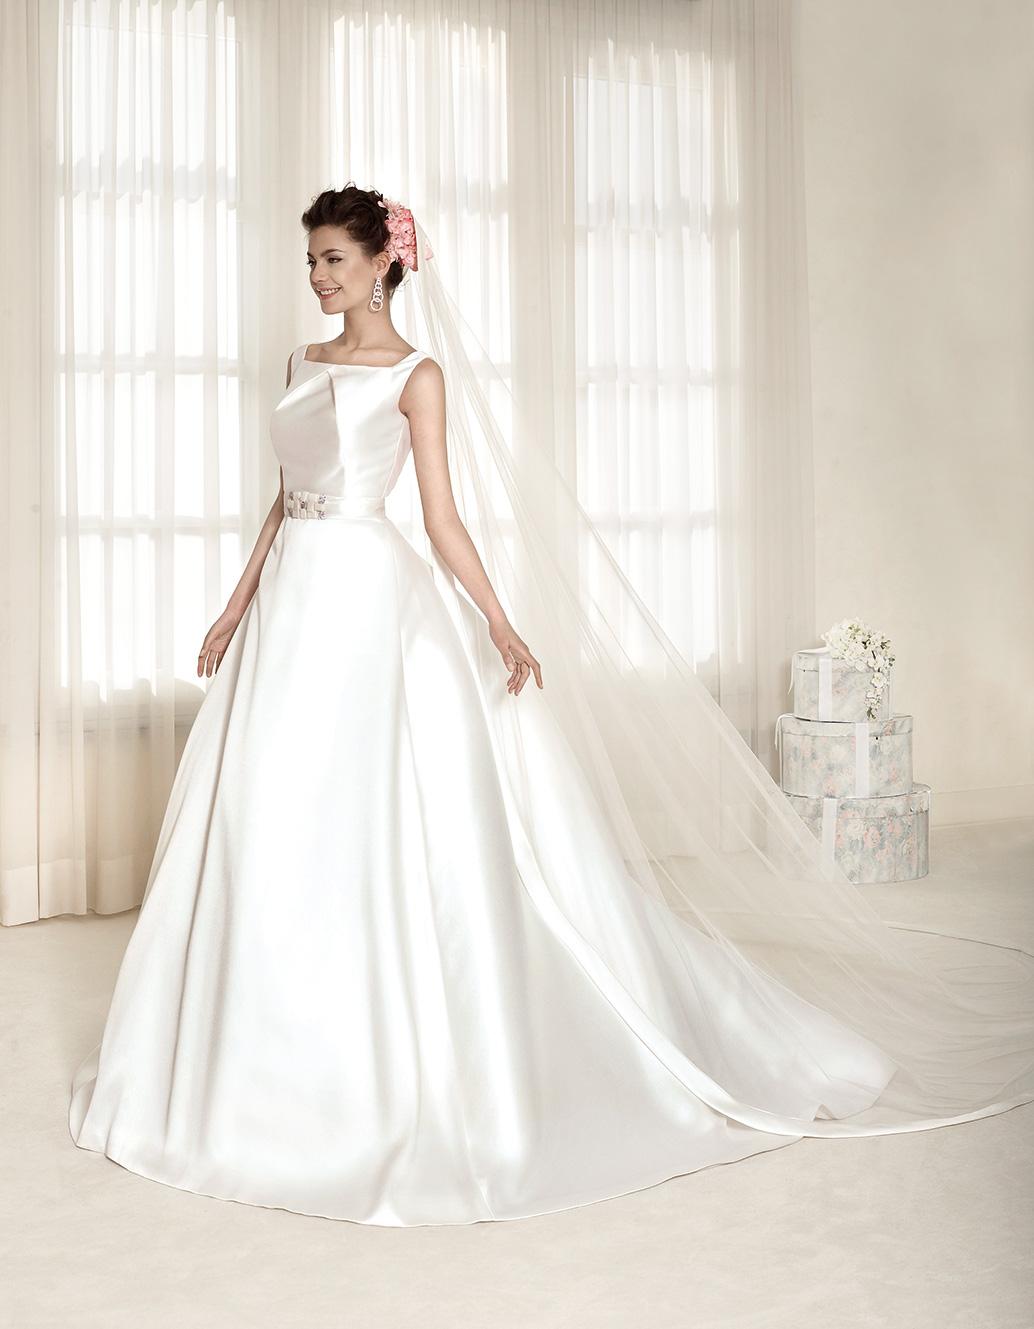 Sposa Spose Cristina Mikado Delsa Abito 2015 Maria 5K13TuFJlc